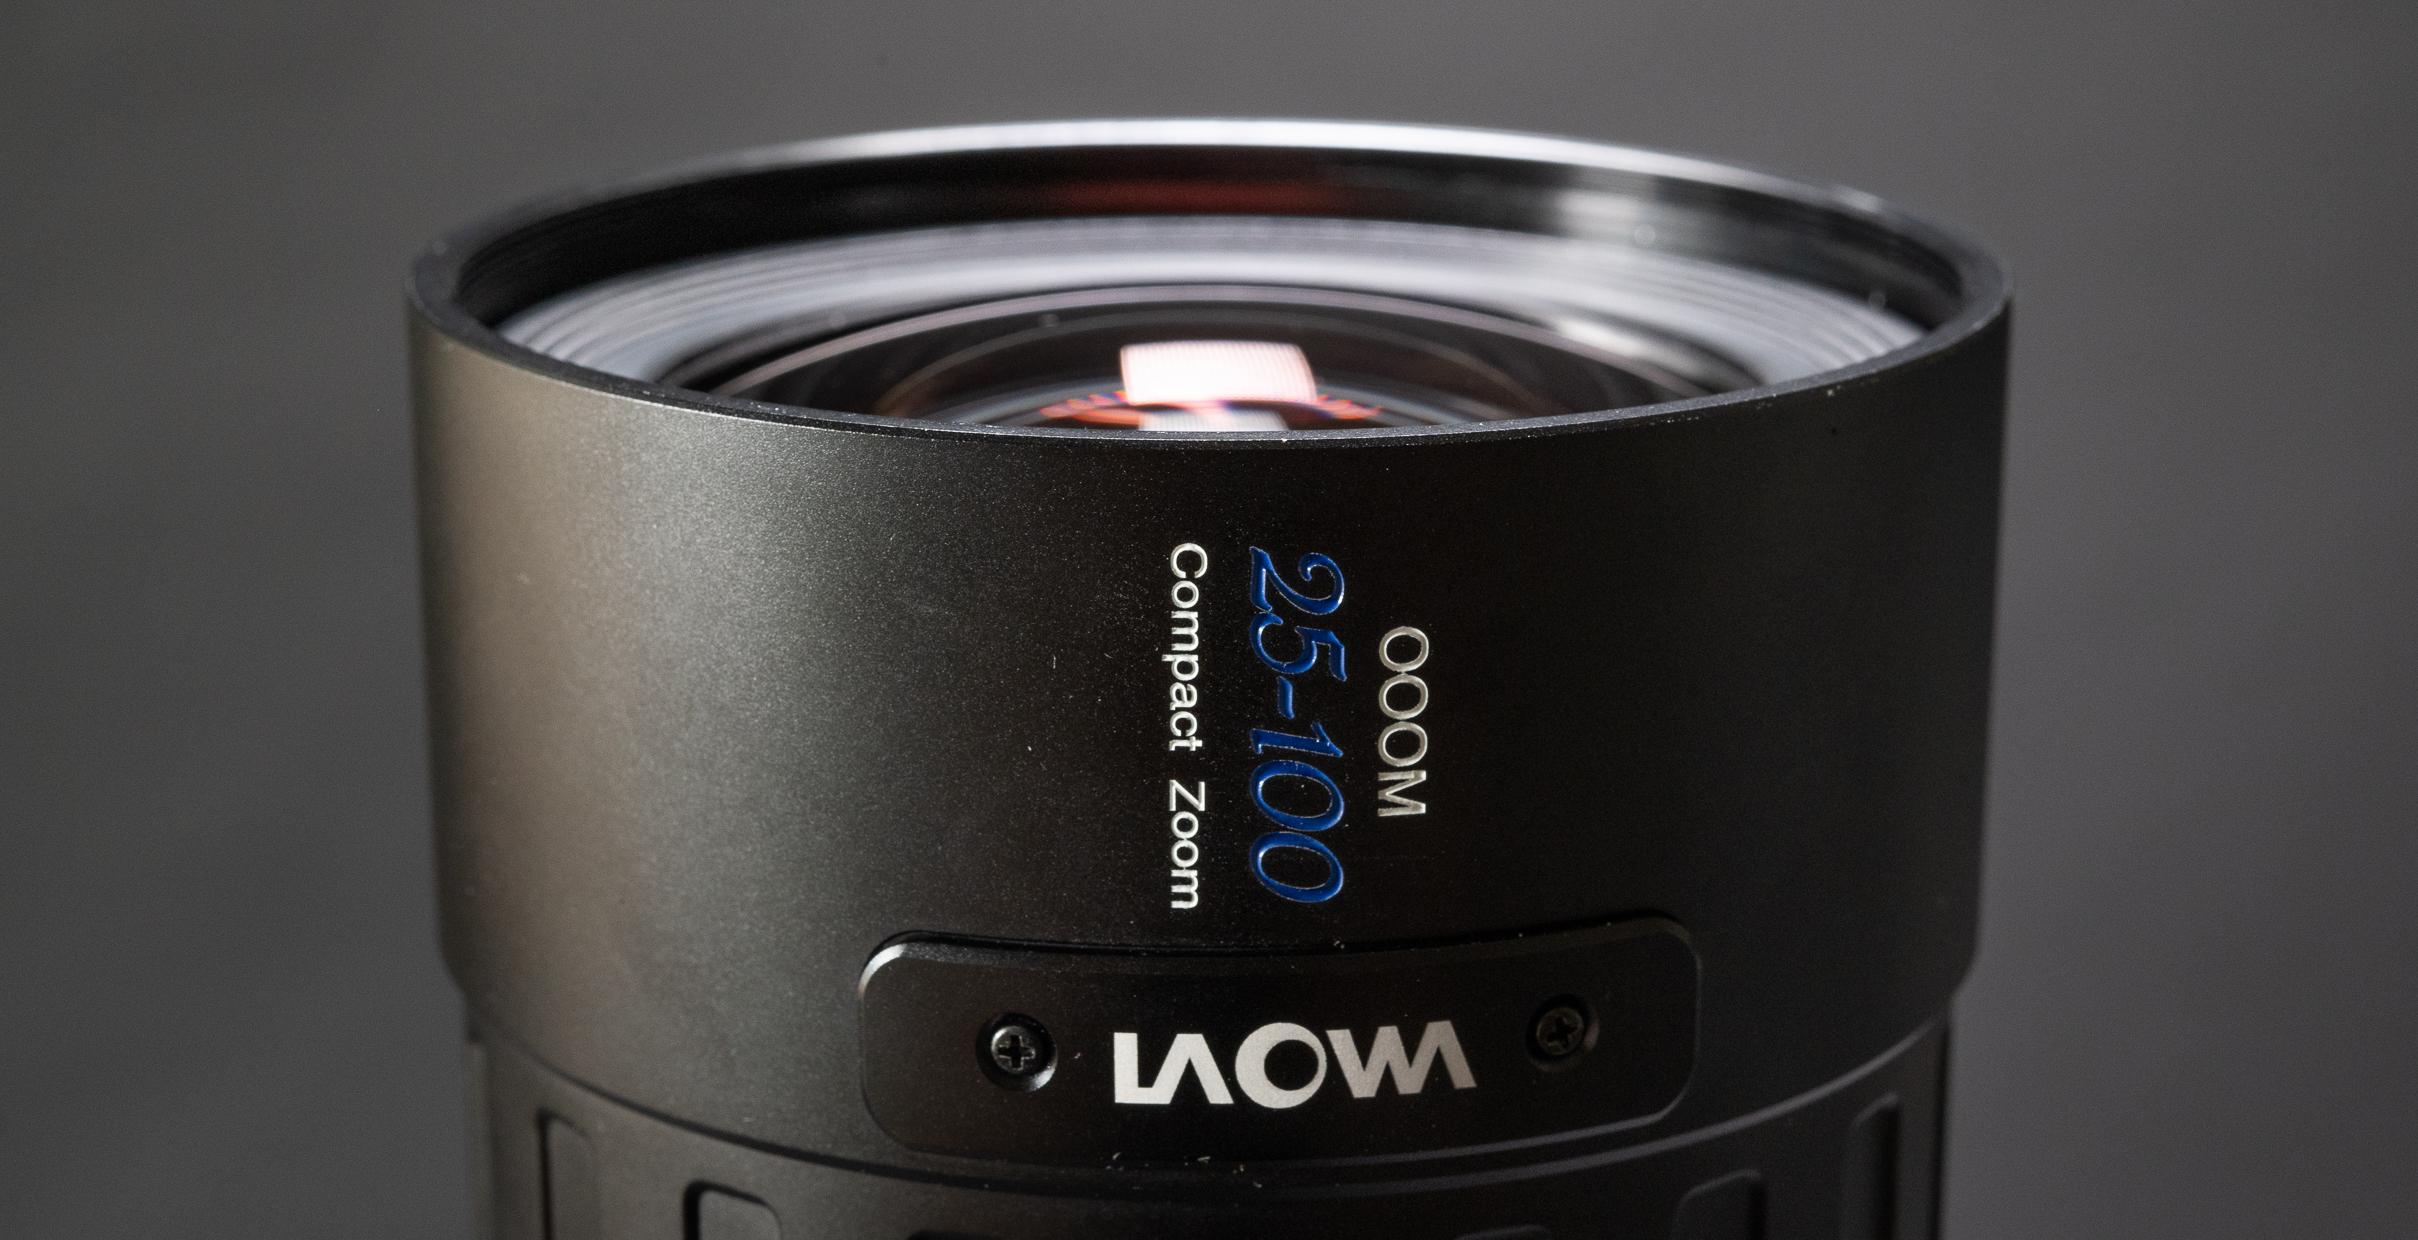 Laowa OOOM 25-100mm